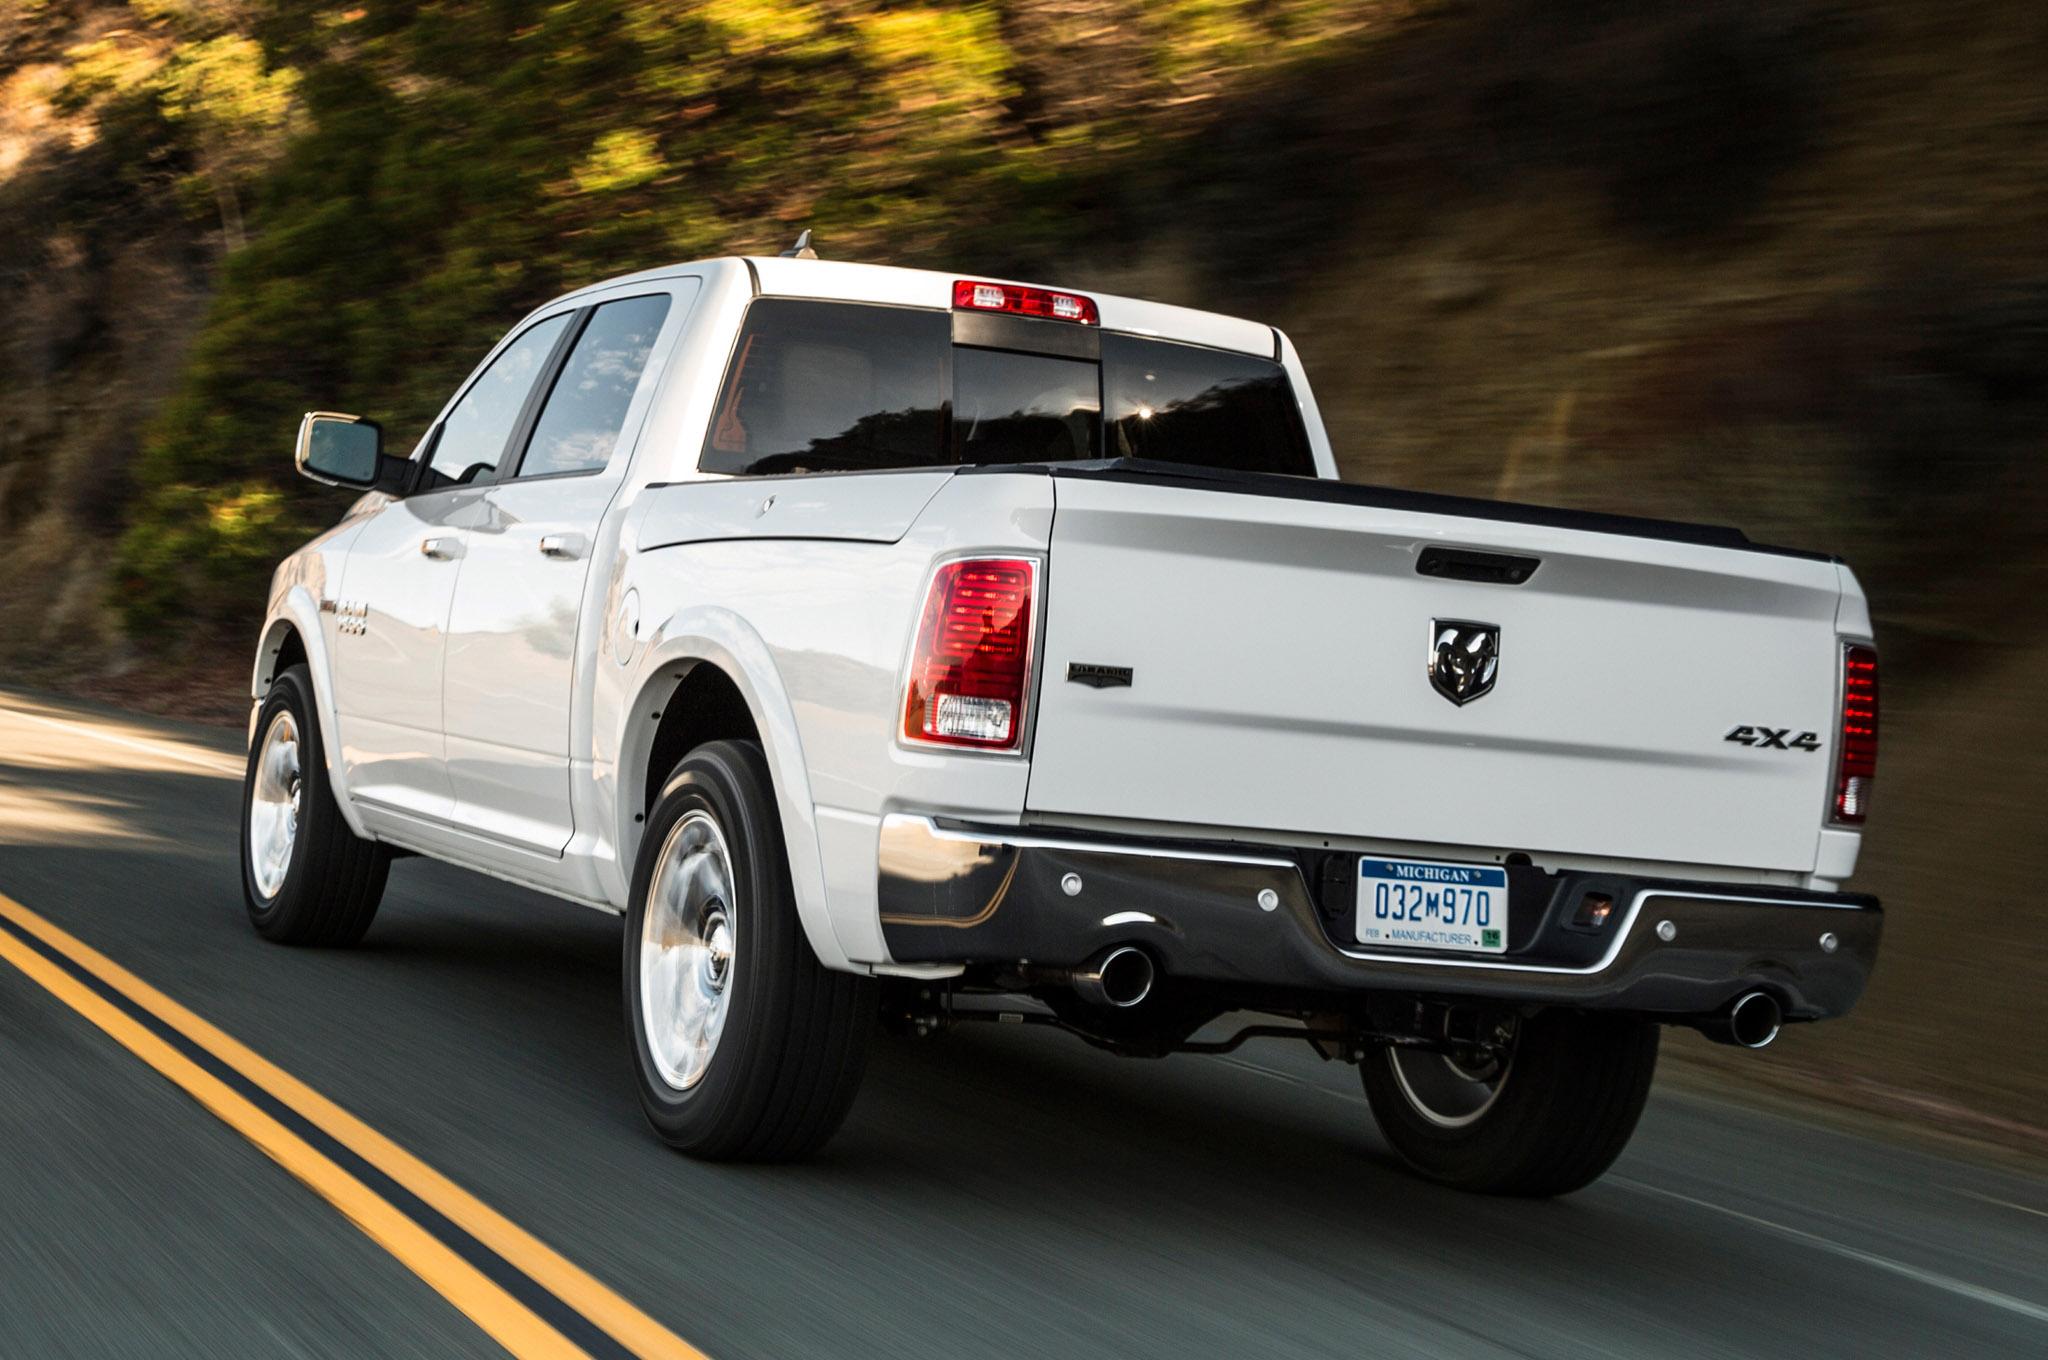 2014 dodge ram 1500 ecodiesel records best fuel economy rating. Black Bedroom Furniture Sets. Home Design Ideas